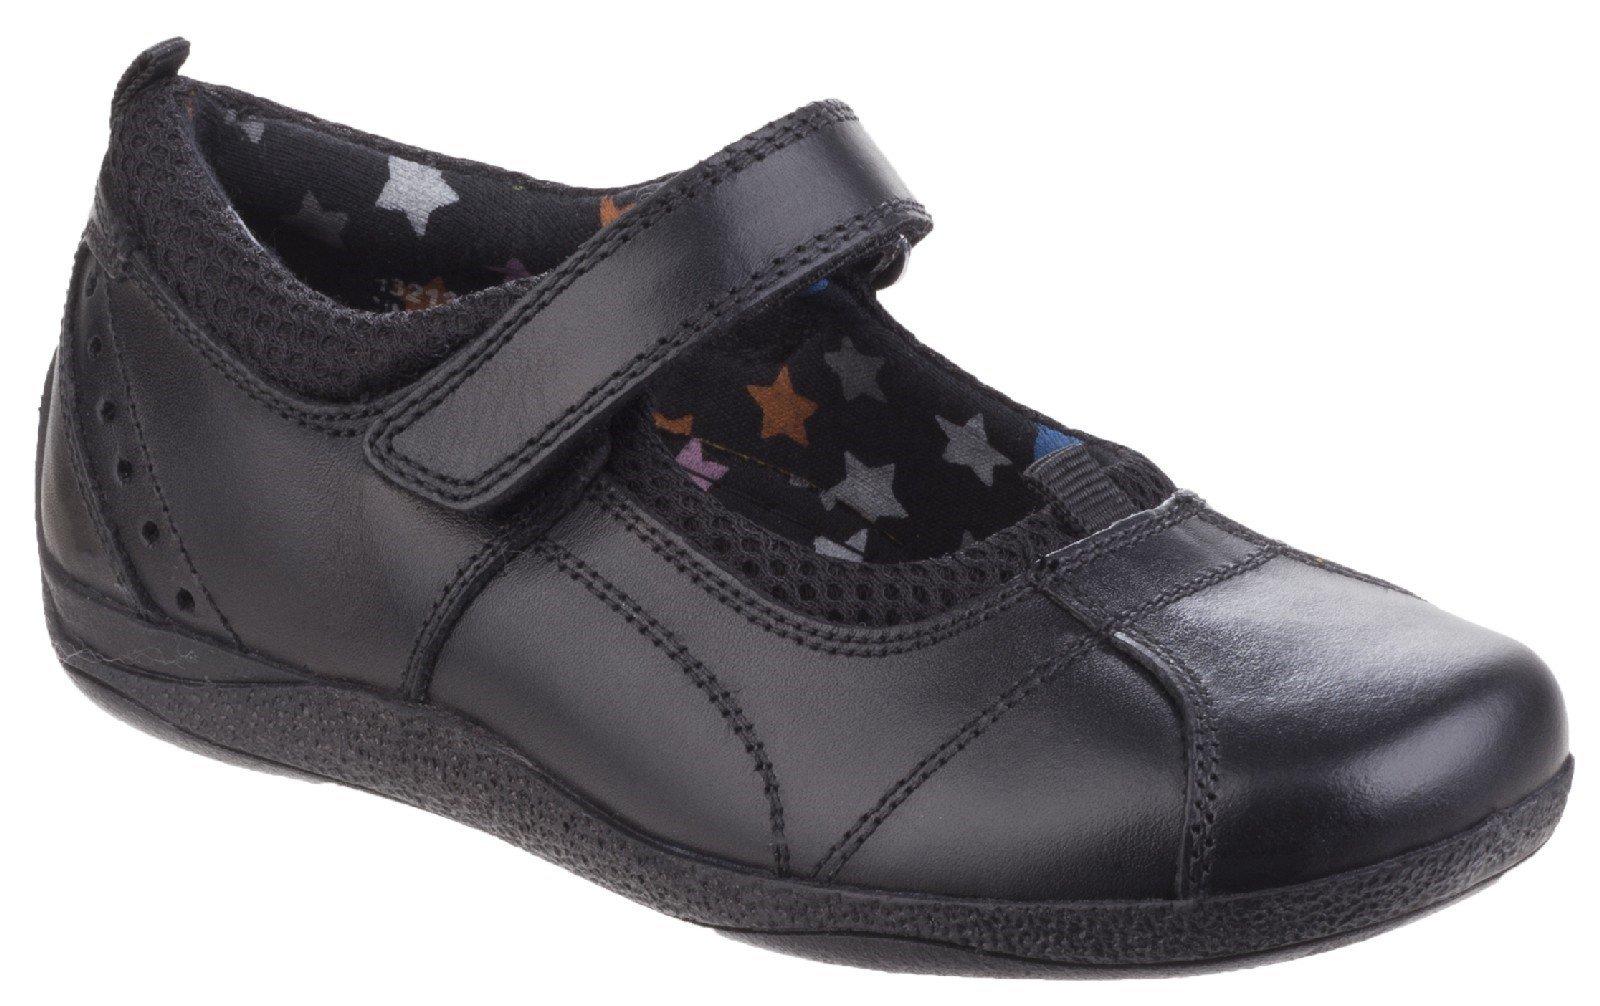 Hush Puppies Kid's Cindy Back To School Shoe Black 25319 - Black 10 UK